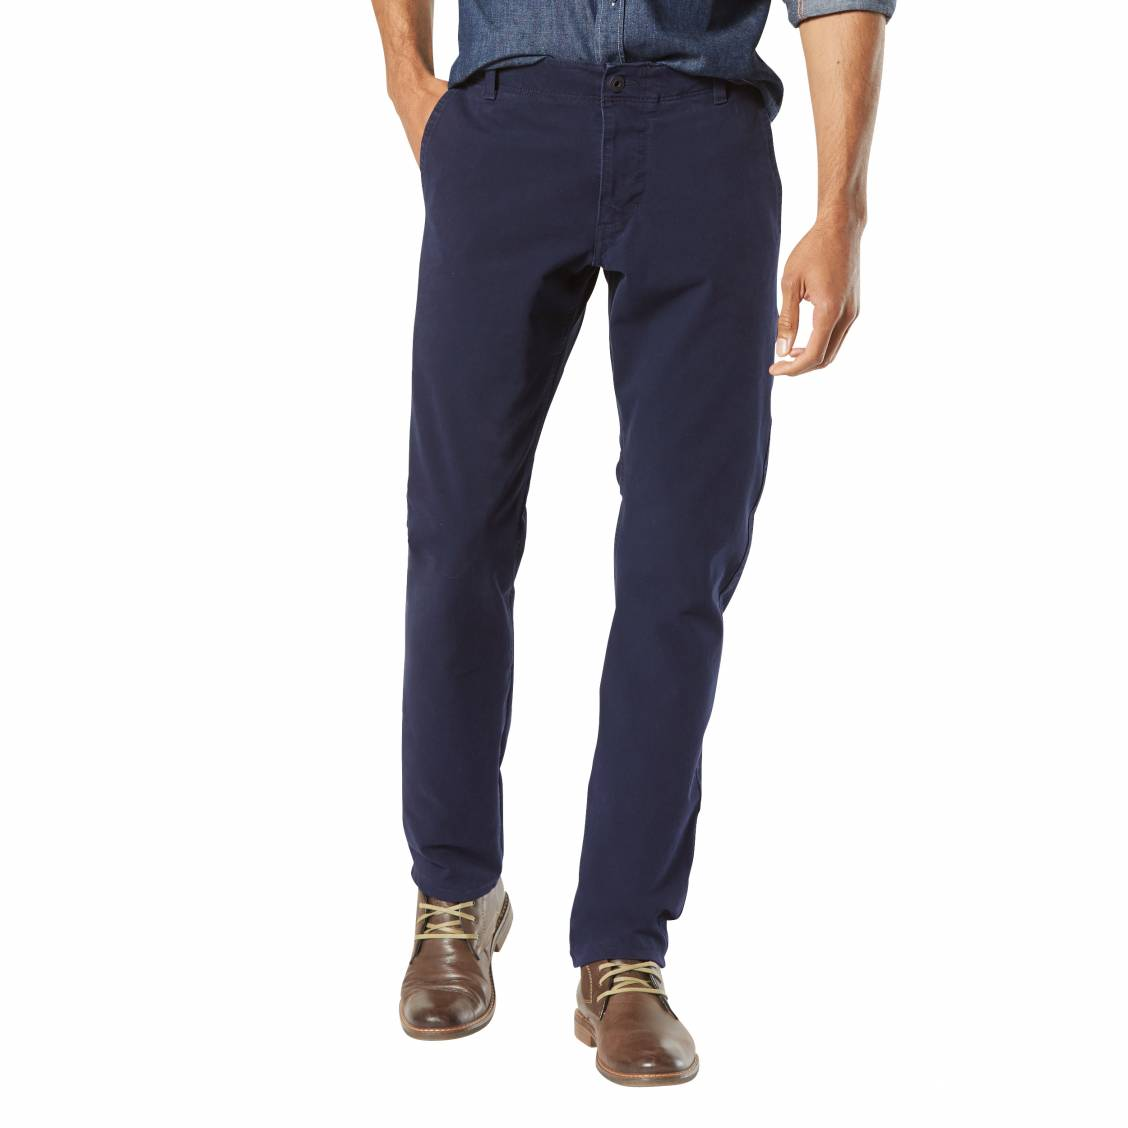 Pantalon  smart 360 flex alpha, slim tapered pembroke bleu marine